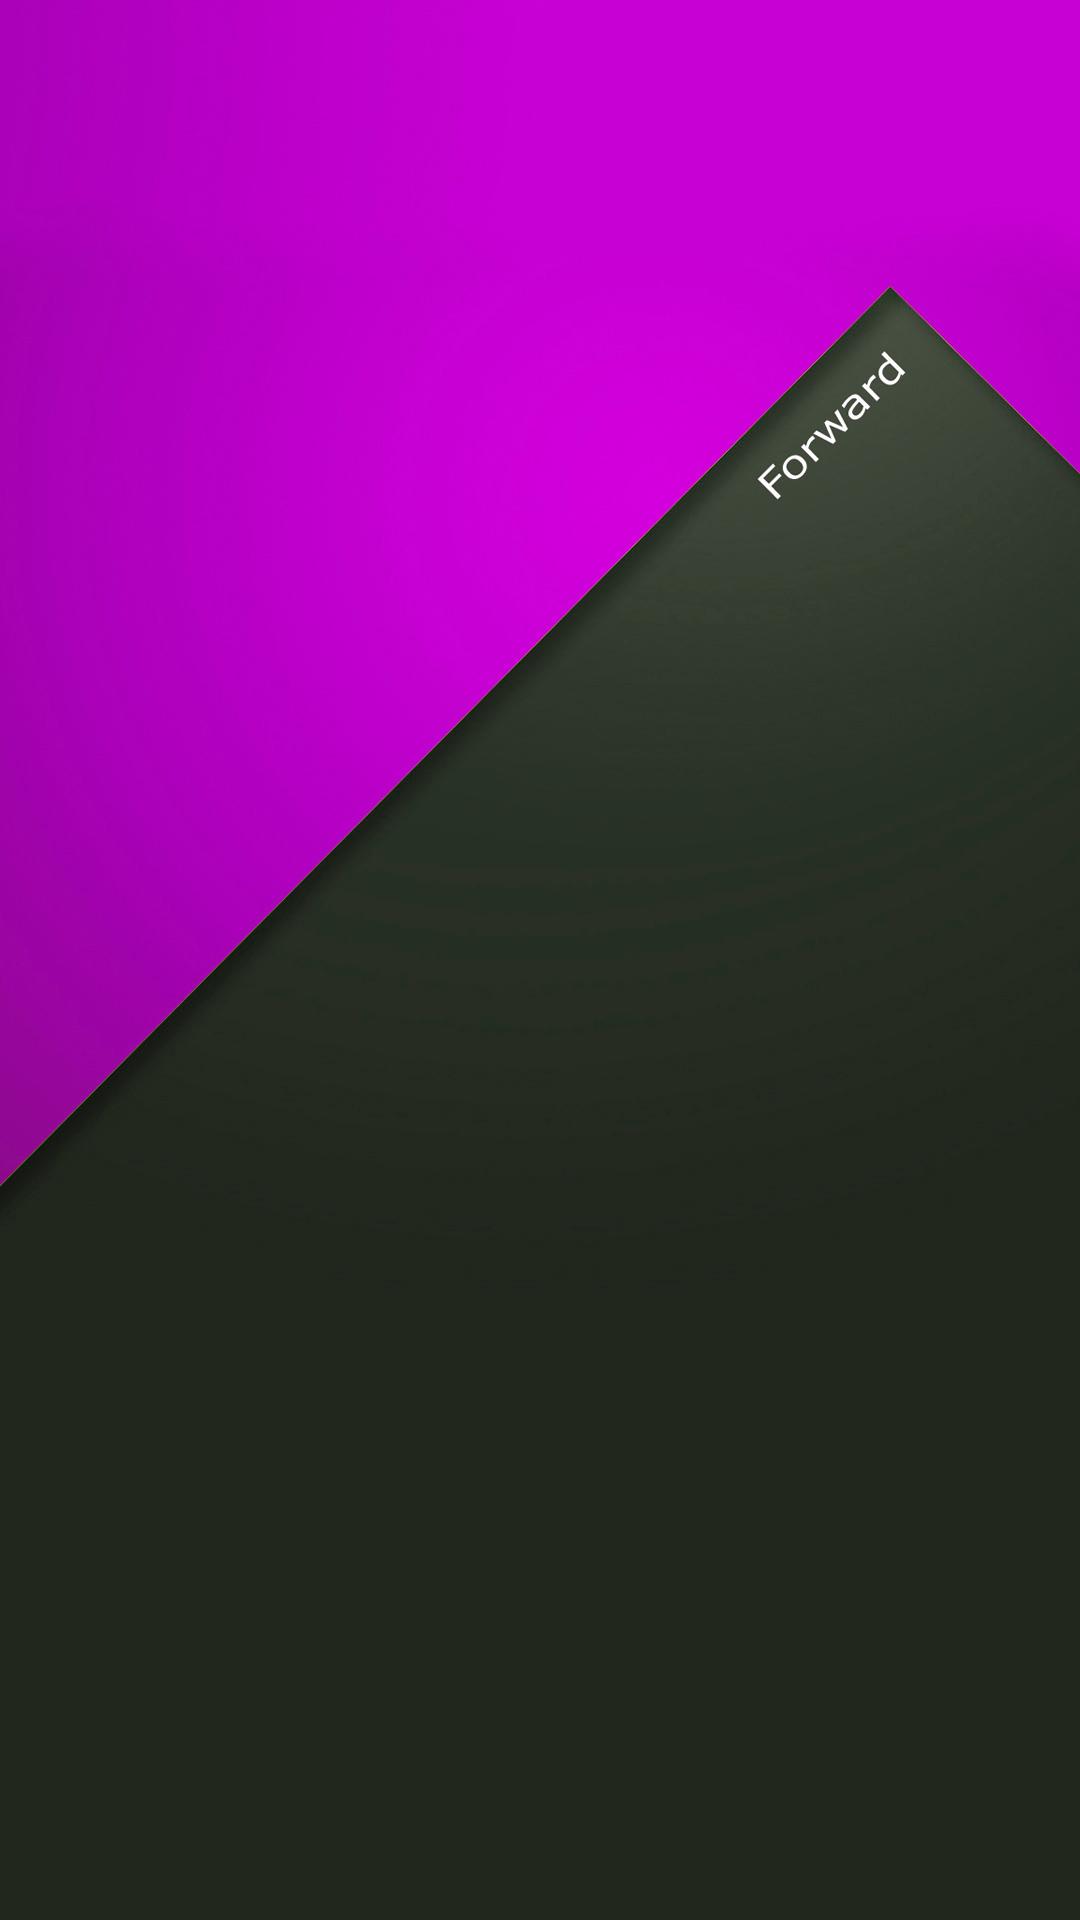 samsung smartphone wallpapers